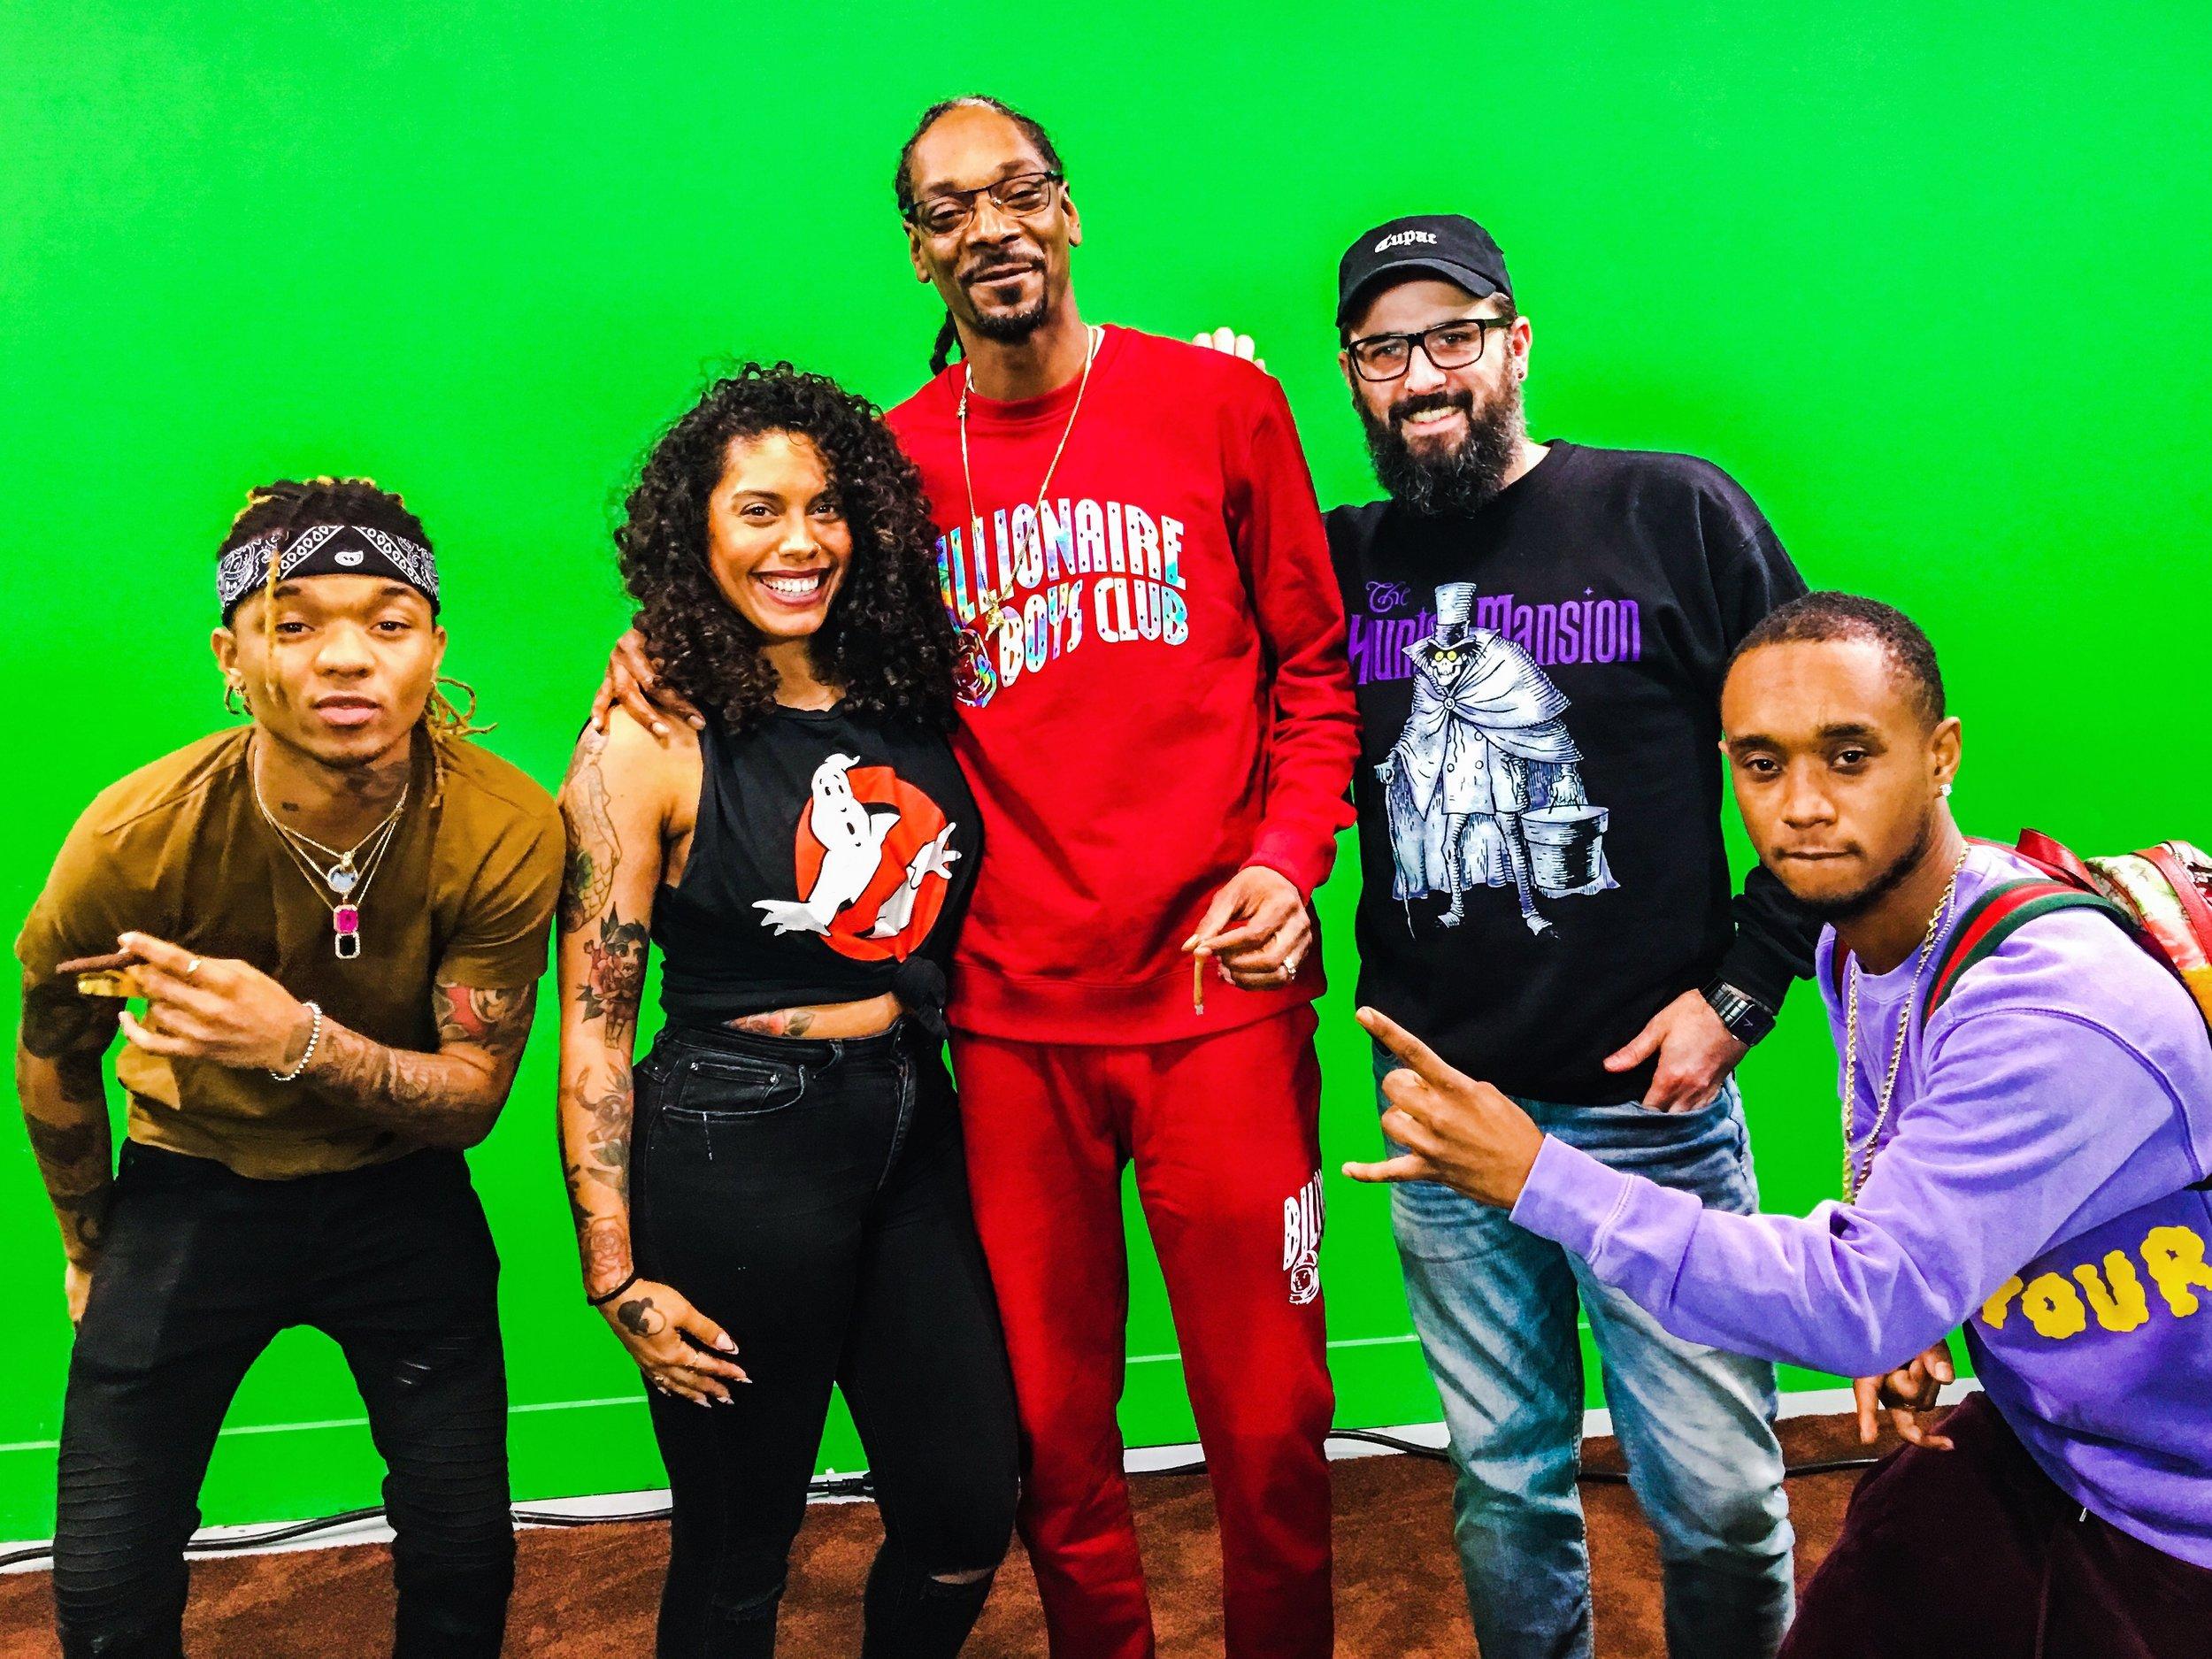 On set of GGN with Rae Sremmurd & Snoop Dogg